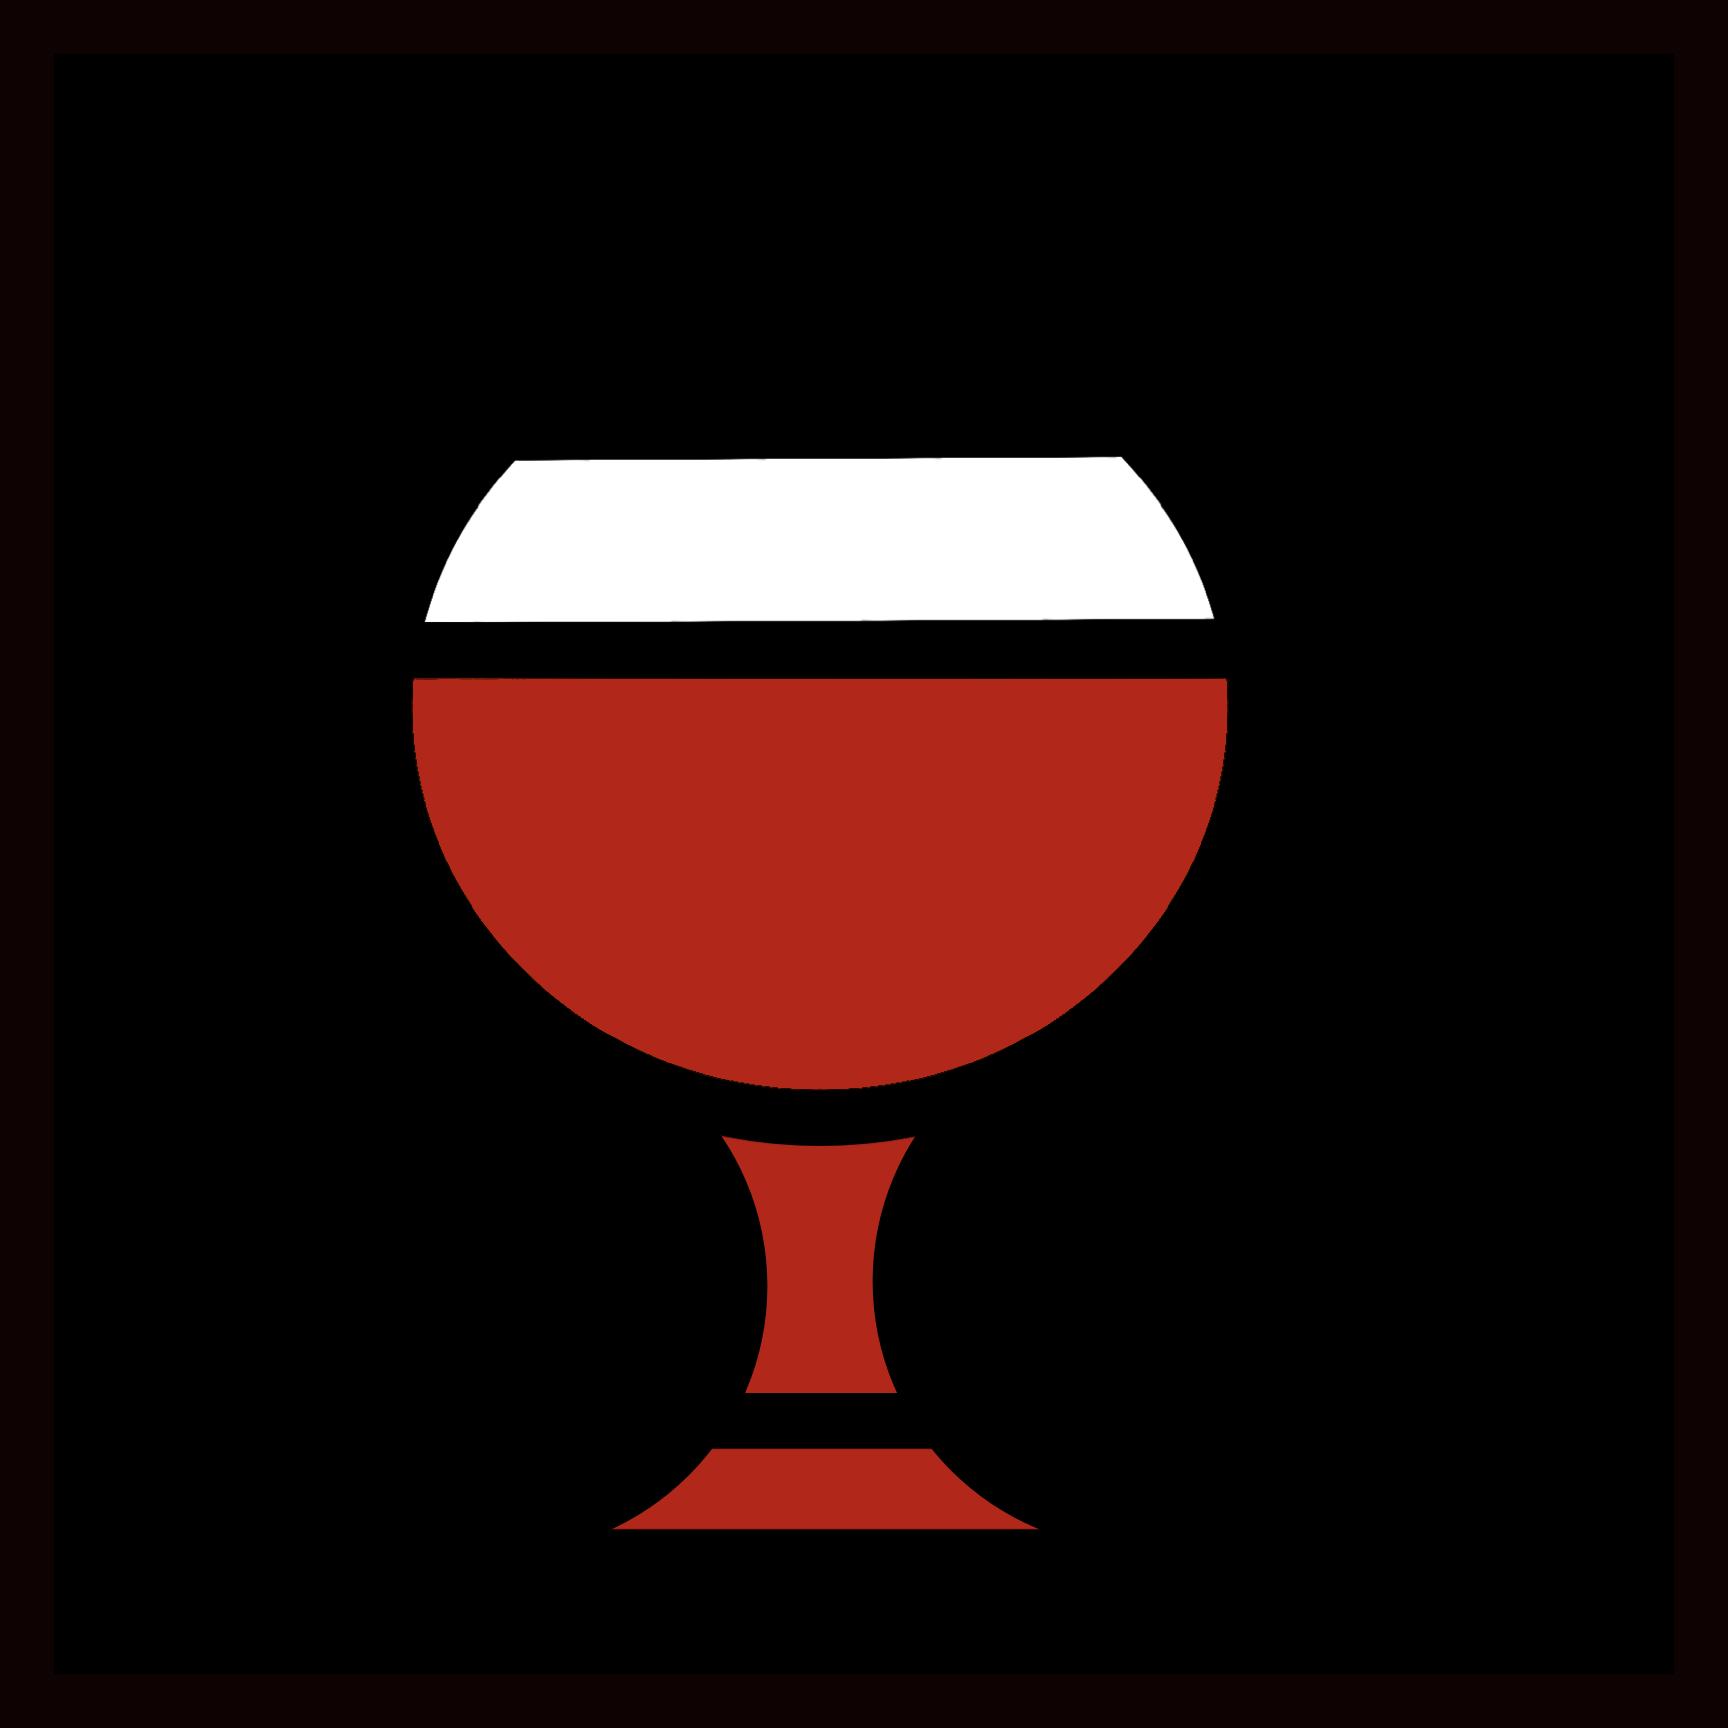 goblet red.png